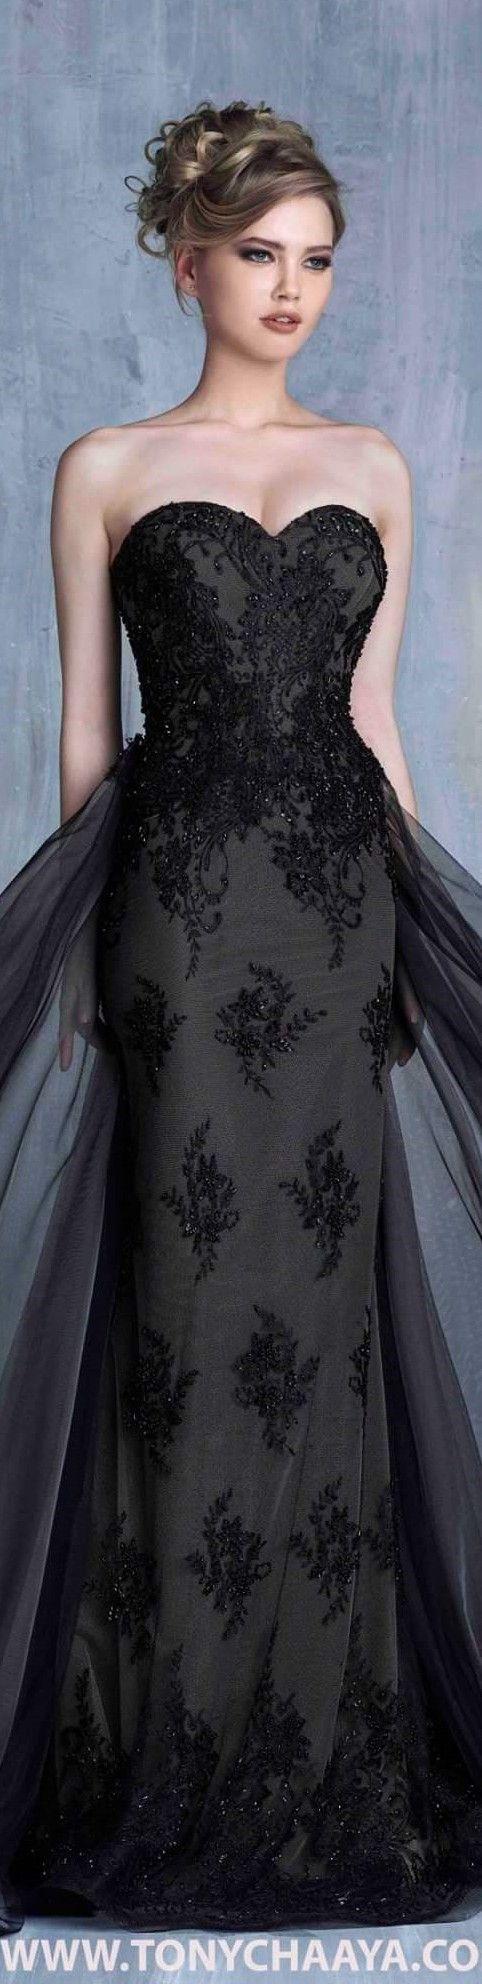 //Tony Chaaya couture 2016 #fashion #womenswear #couture